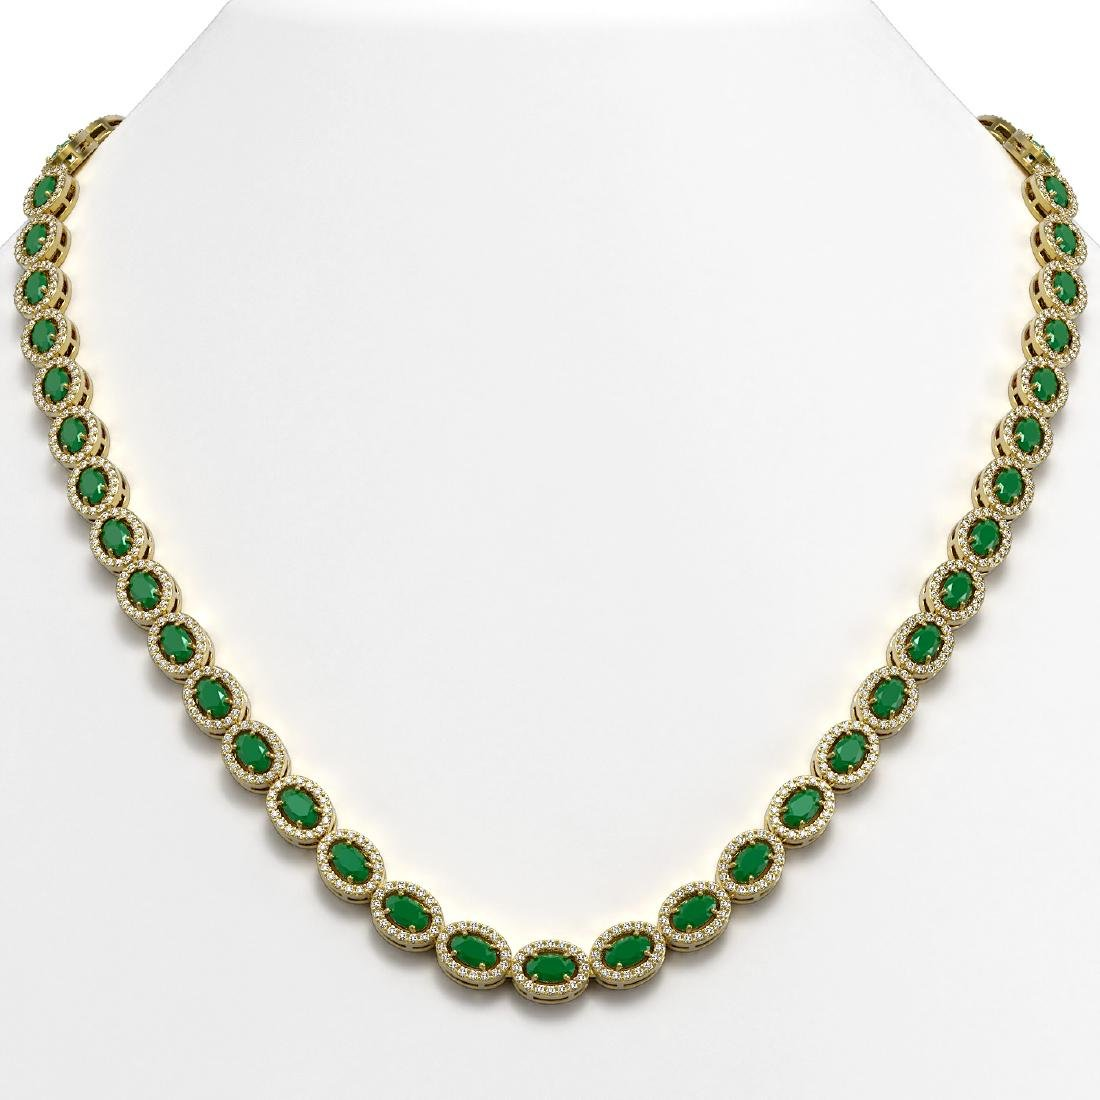 26.38 CTW Emerald & Diamond Halo Necklace 10K Yellow